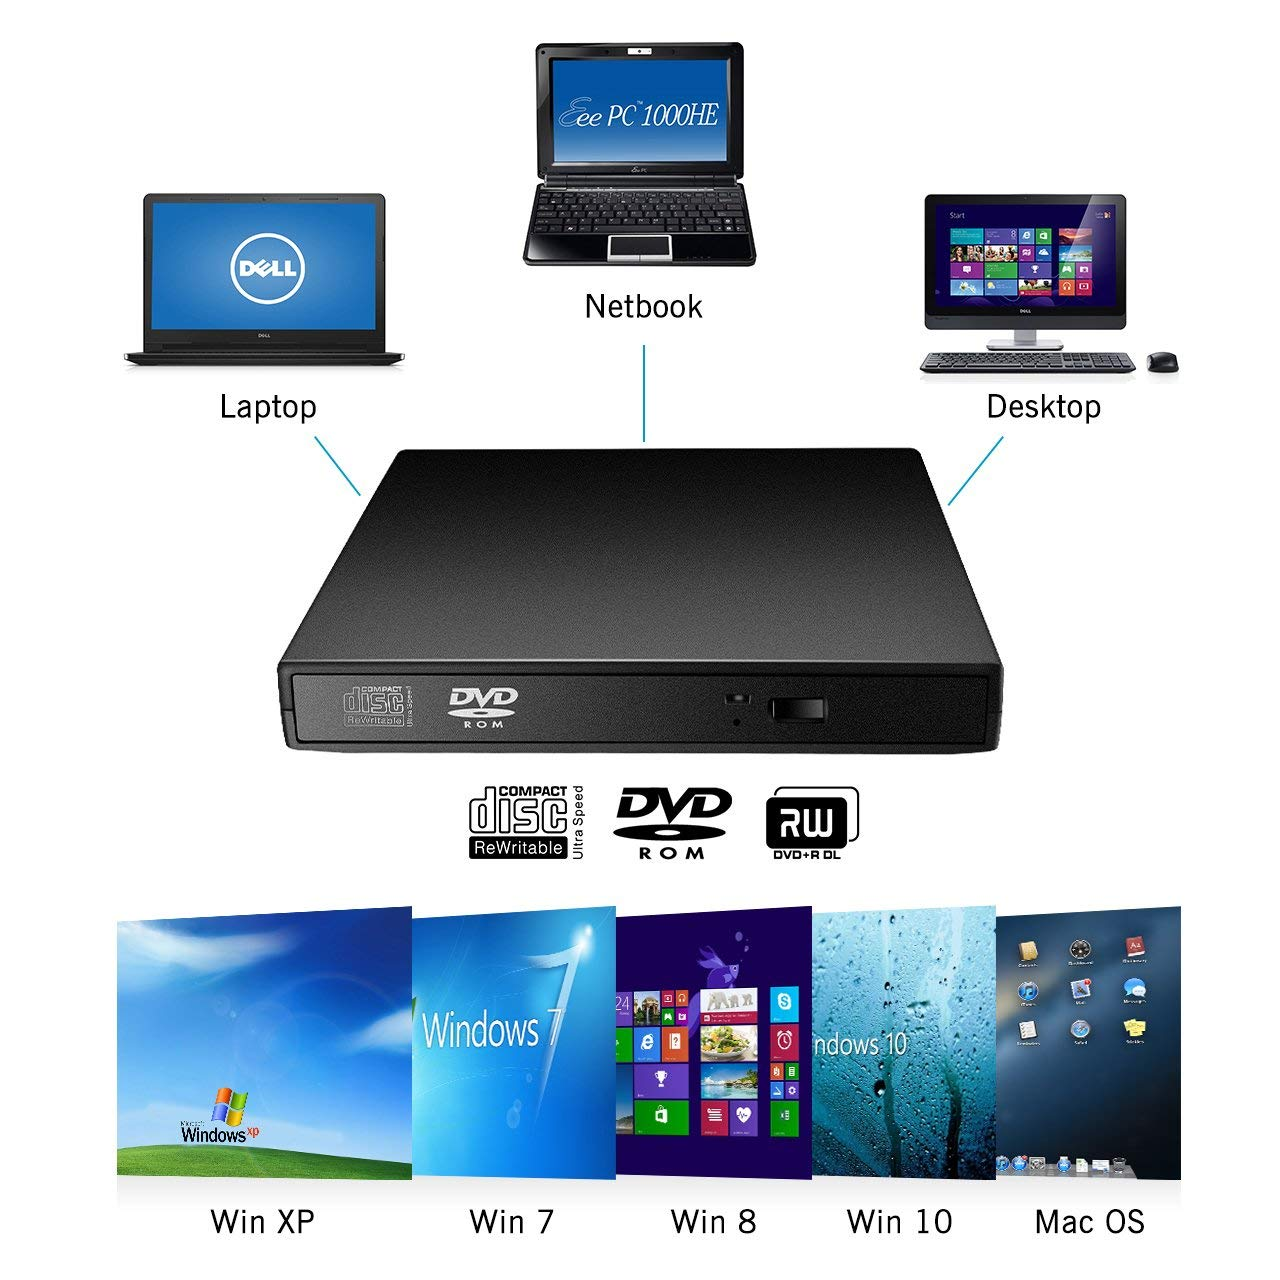 Amazon.com: Unidad de DVD externa delgada portátil CD ...